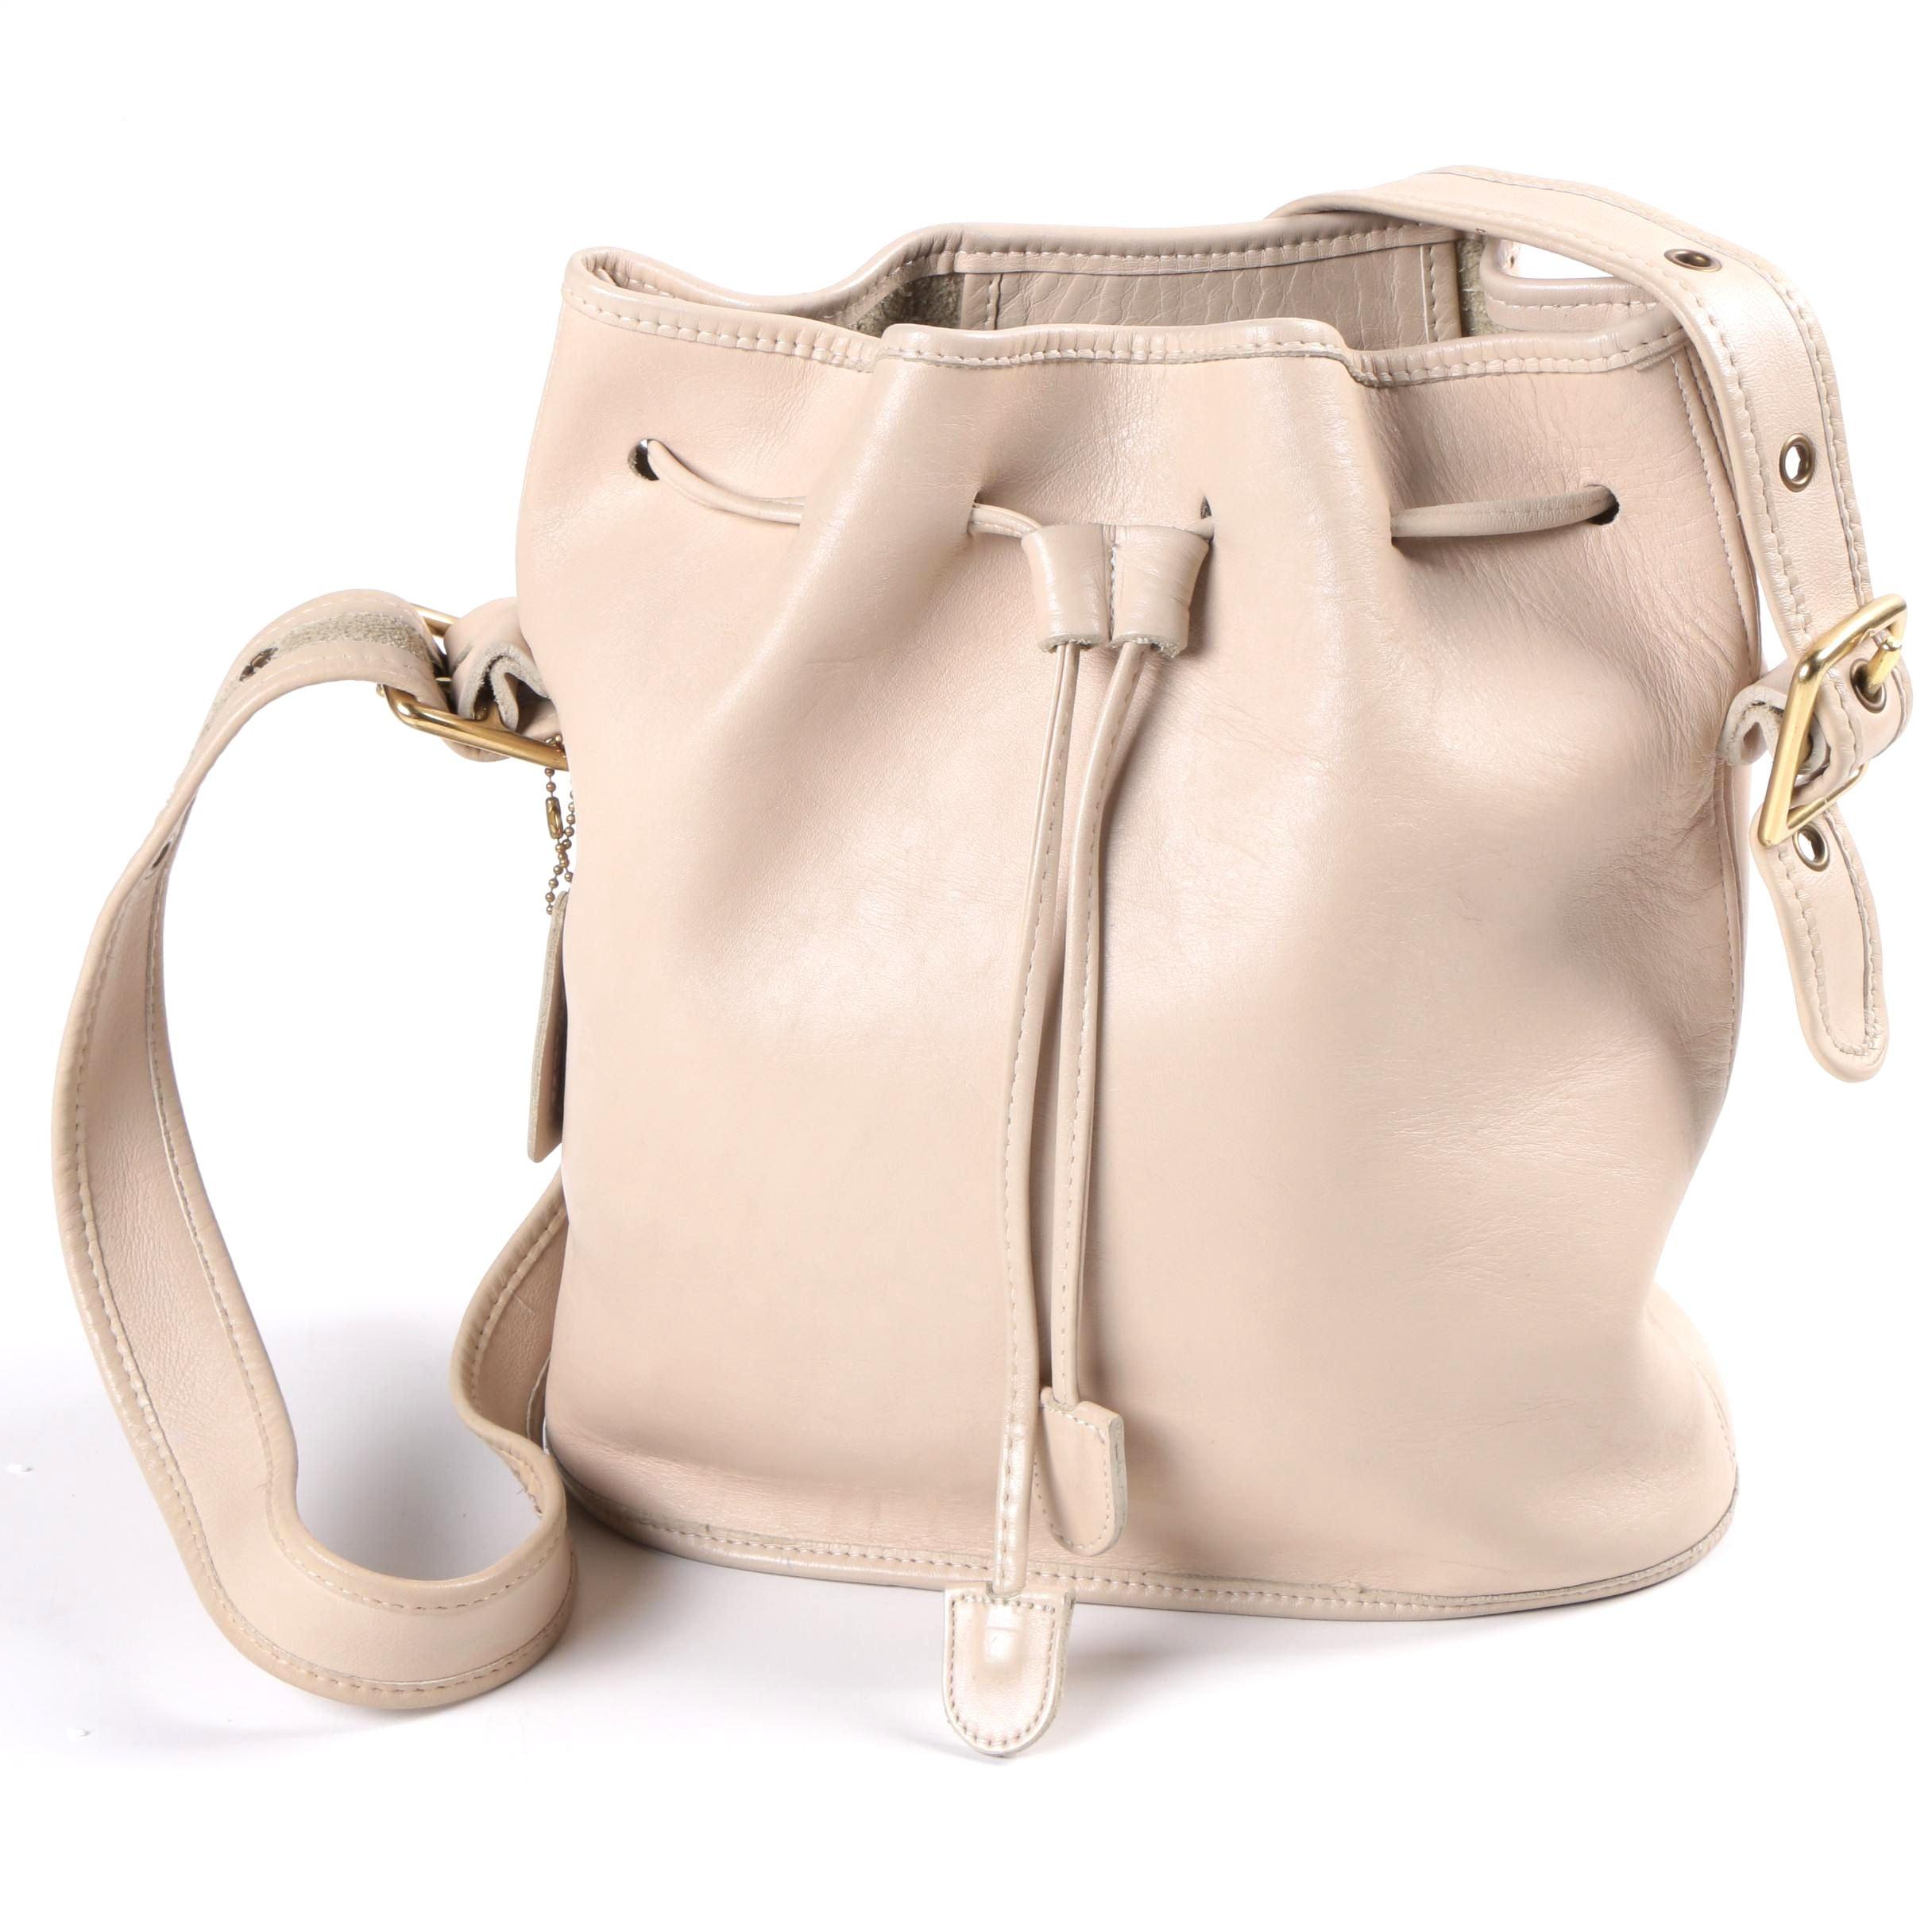 Coach Cream Leather Drawstring Bucket Bag